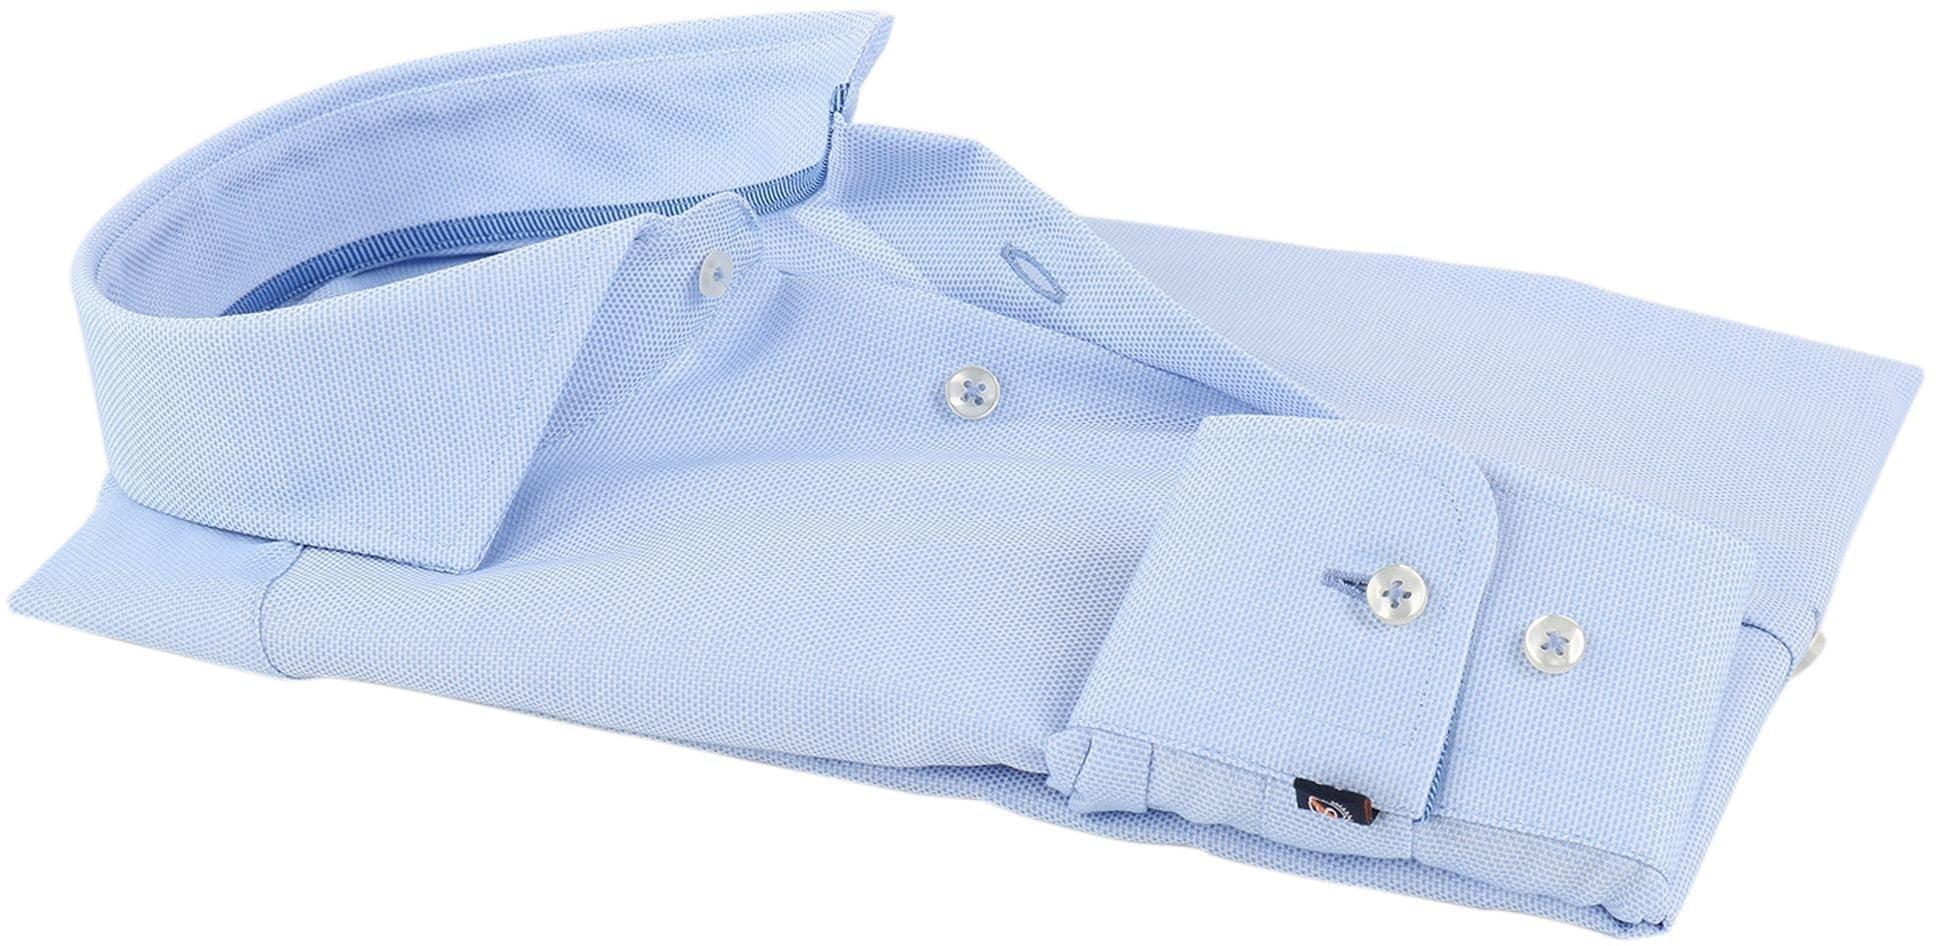 Mouwlengte 7 Overhemd Blauw 150-4 foto 2